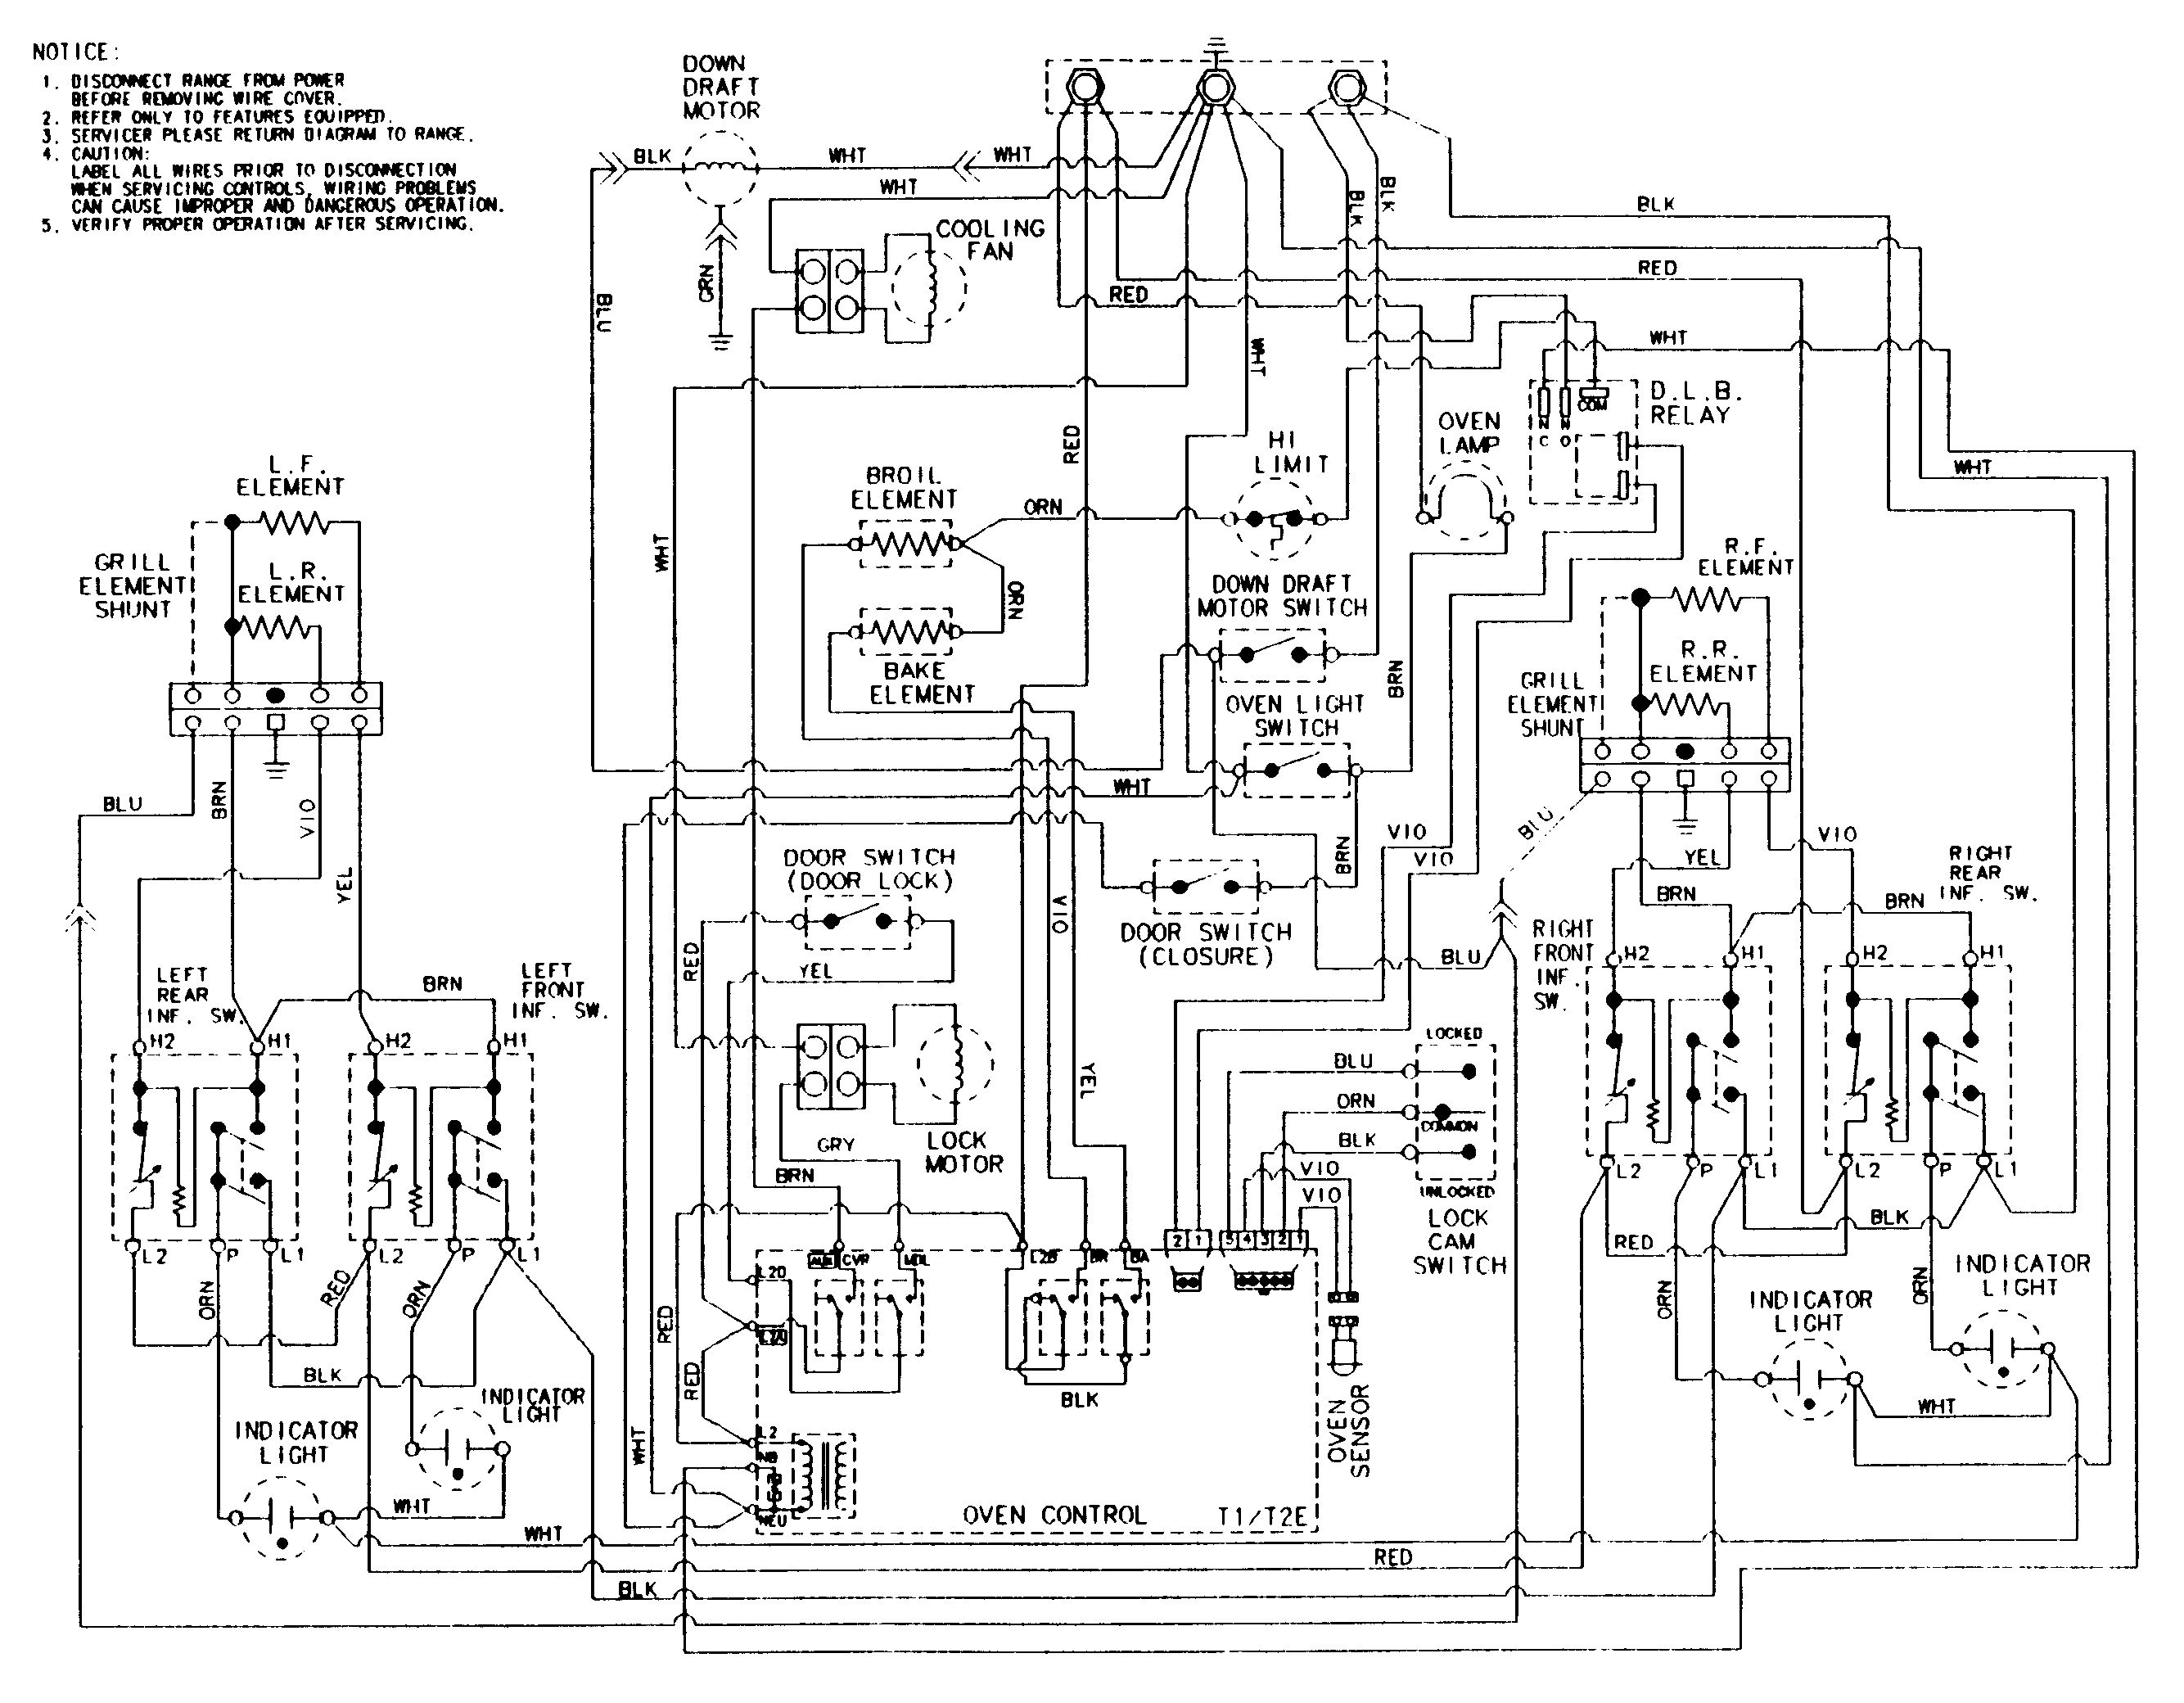 medium resolution of jenn air wiring diagrams wiring diagram query jenn air range wiring diagram jenn air wiring diagrams